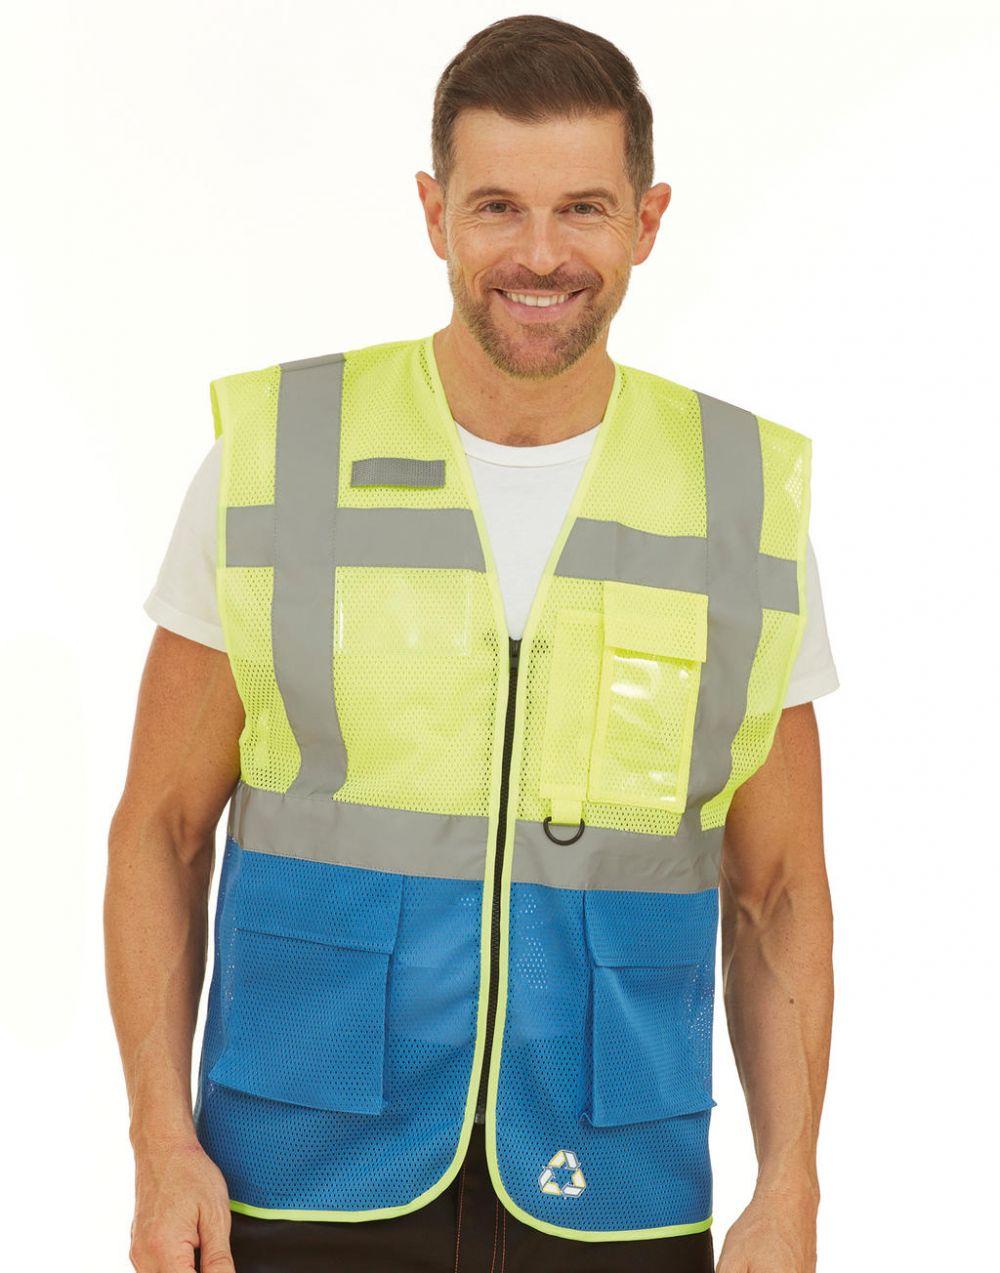 Chalecos reflectantes personalizados yoko fluo executive para personalizar vista 1